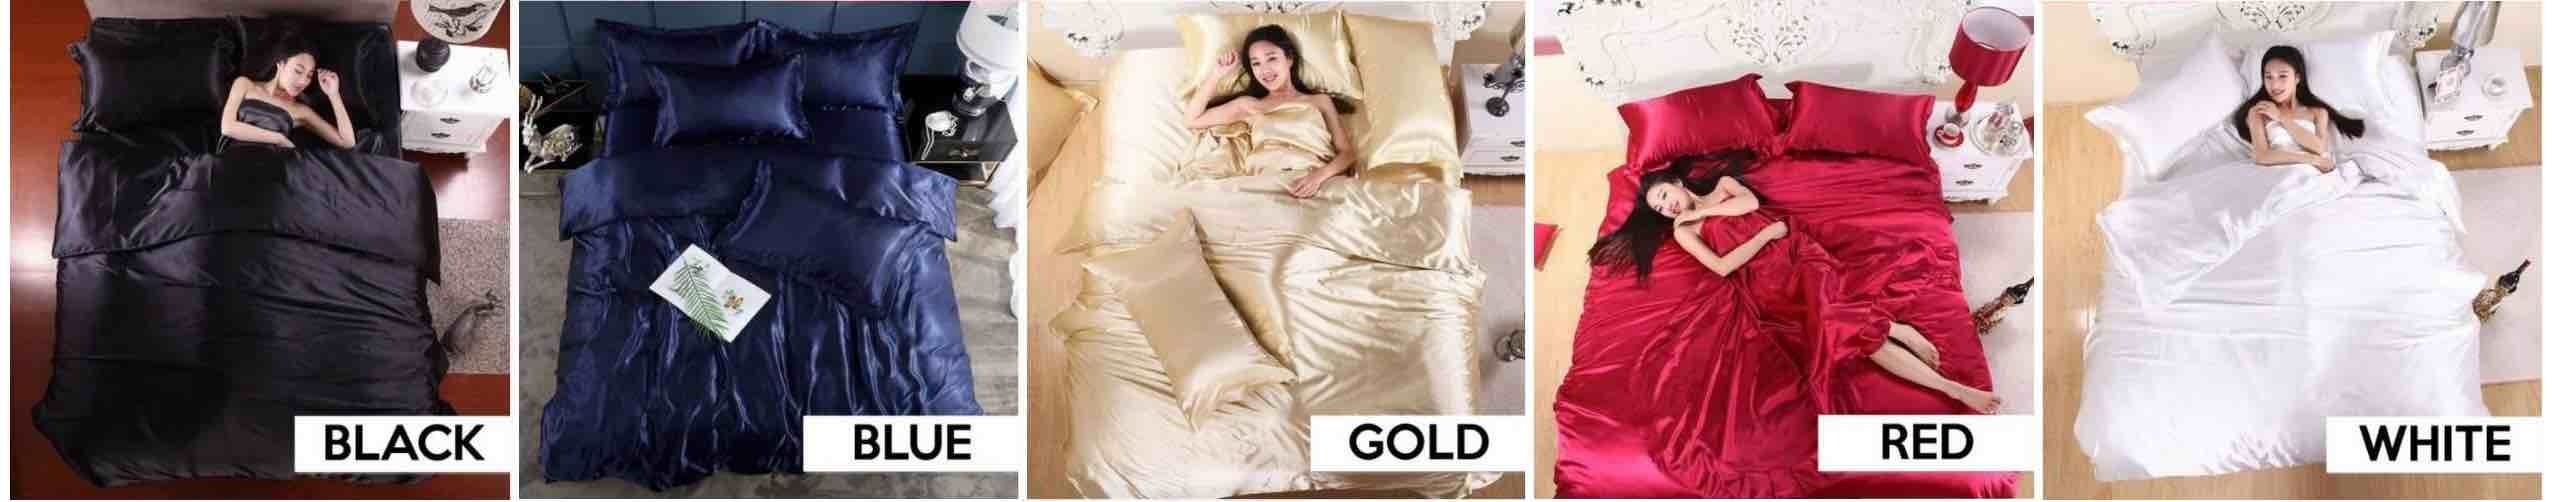 buy silk bed sheets online